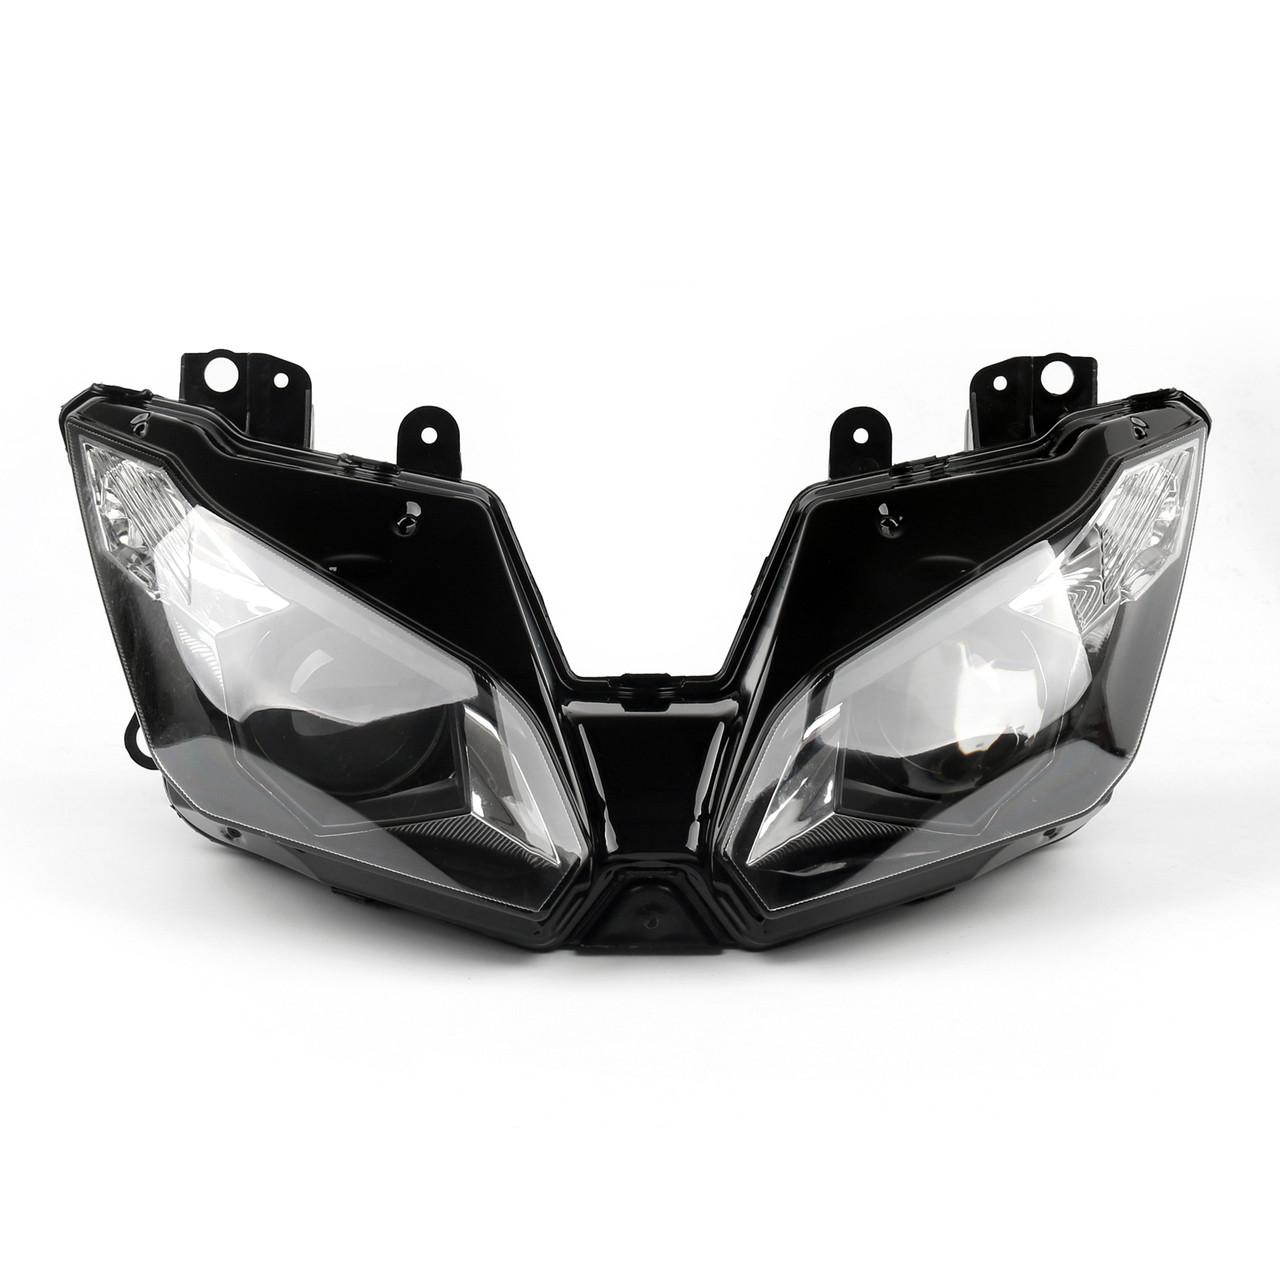 Headlight Assembly Headlamp Kawasaki ZX-6R (2013-2015) Clear